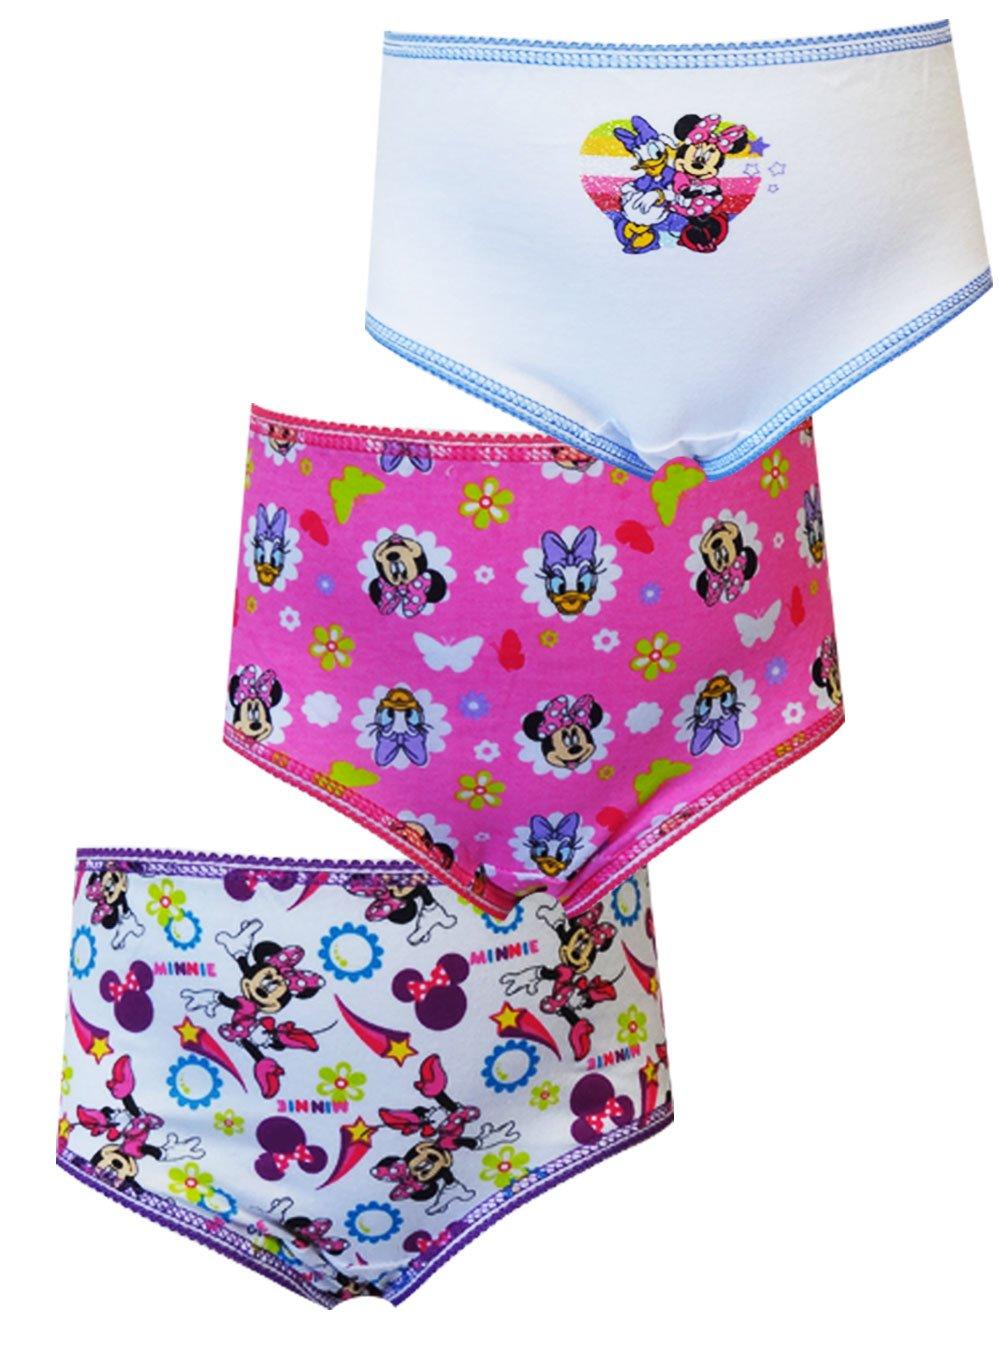 Minnie Mouse Little Girls' Toddler Sensational Fun 3-Pack Panties Disney TGUP7204